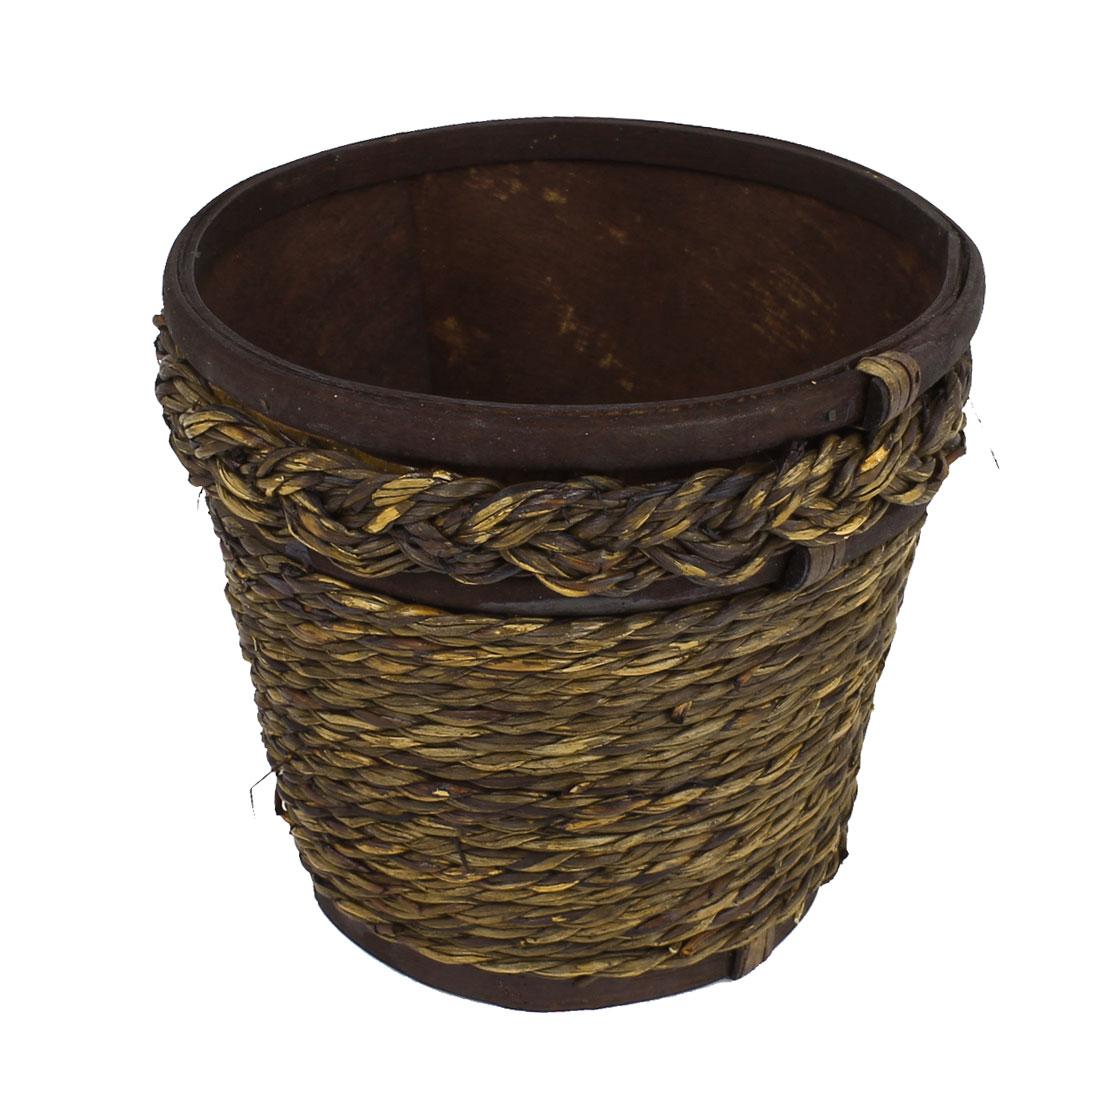 Wooden Frame Rattan Weave Craft Manmade Flowers Basket Holder Decor Brown